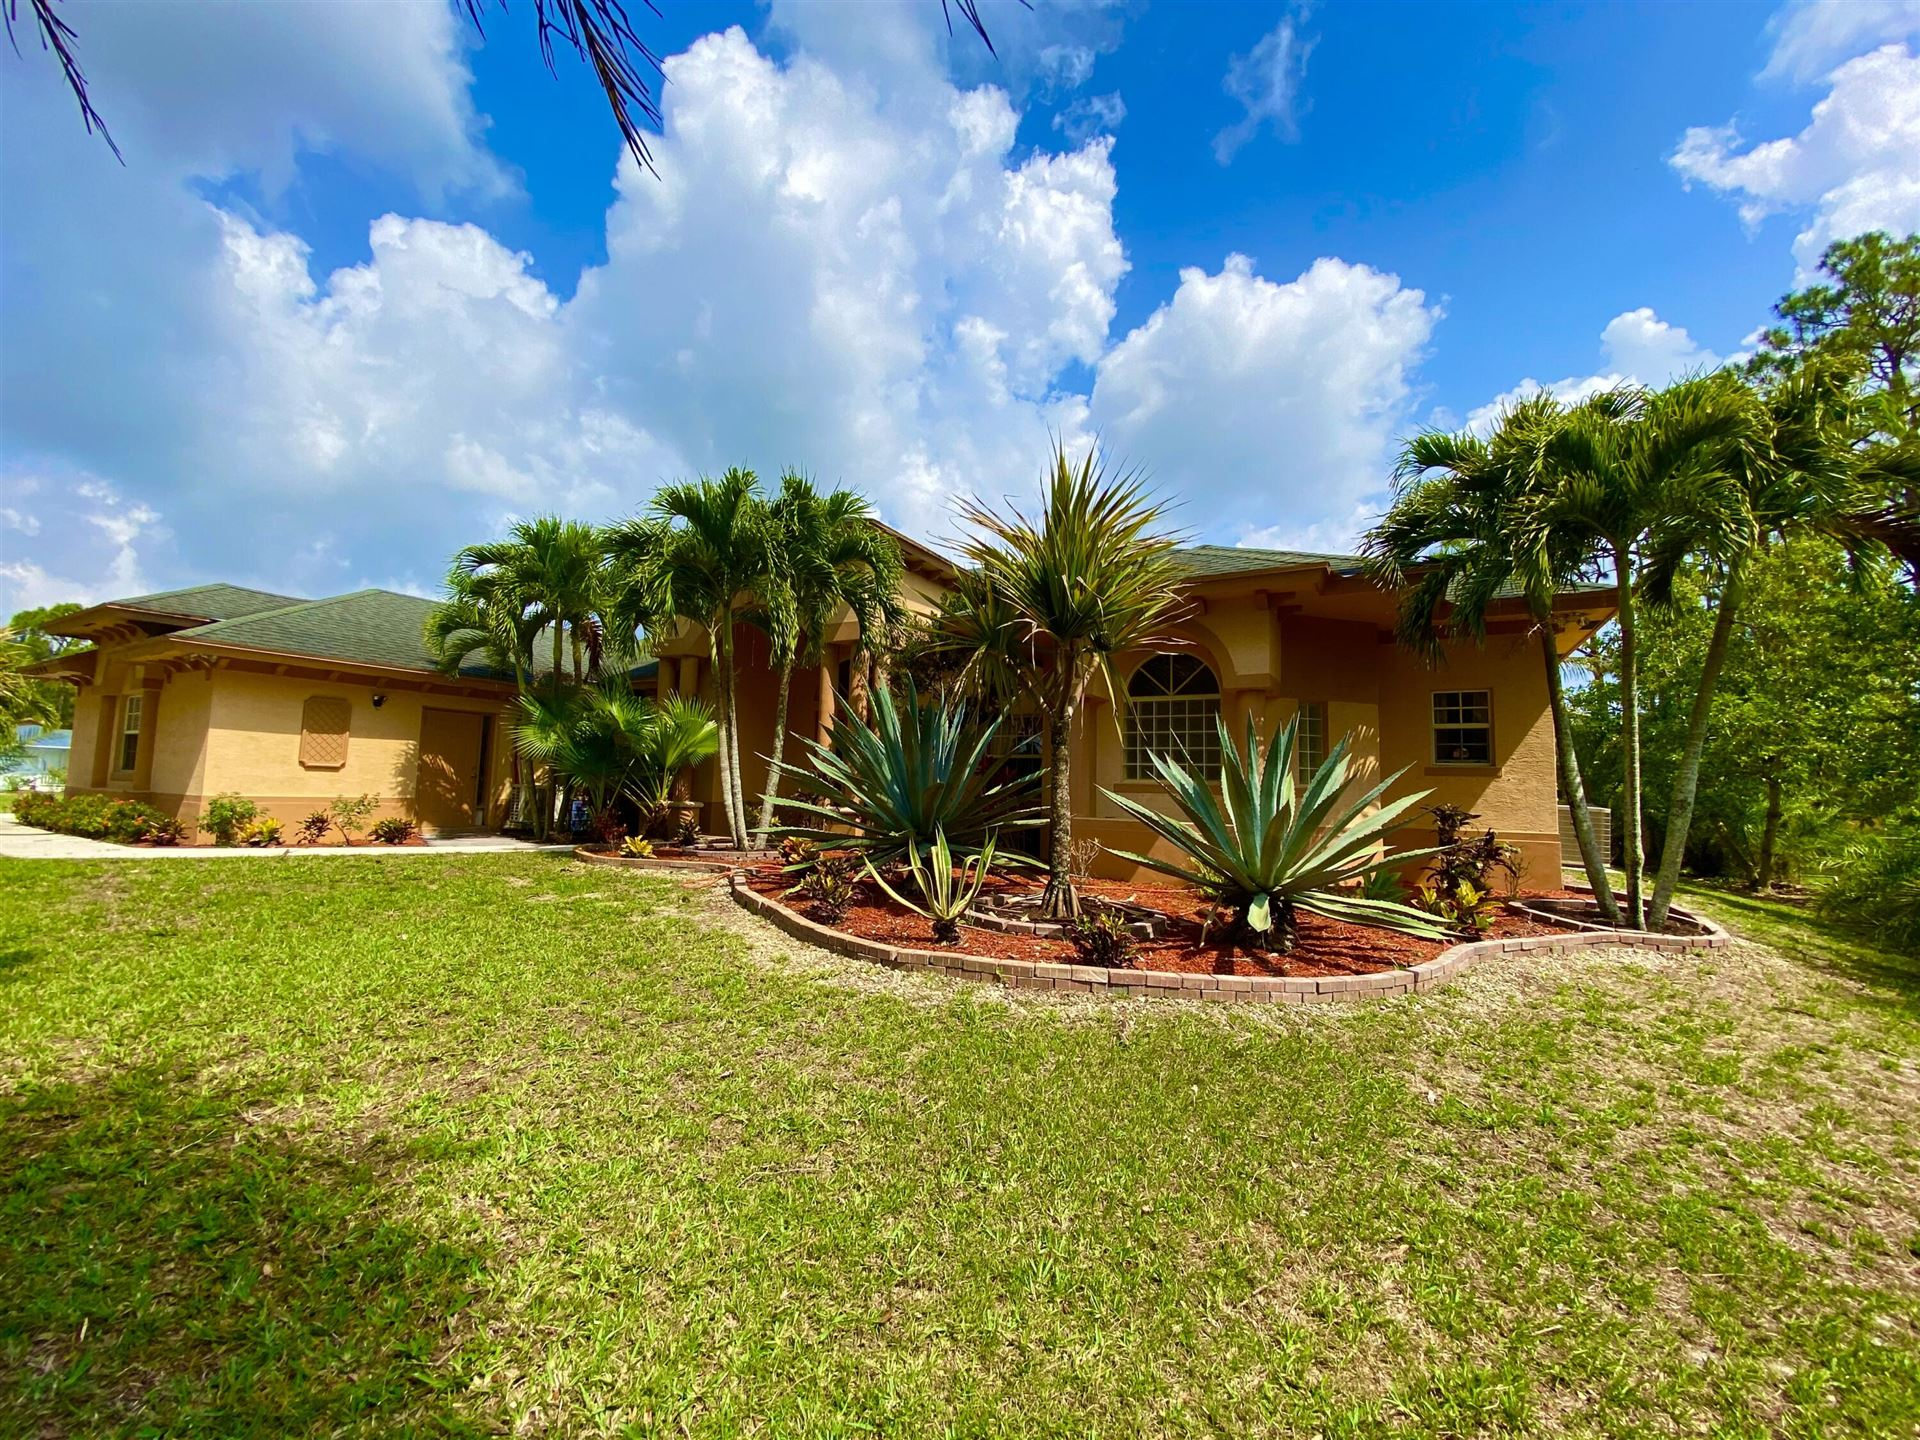 11499 51st Court N, West Palm Beach, FL 33411 - MLS#: RX-10711145